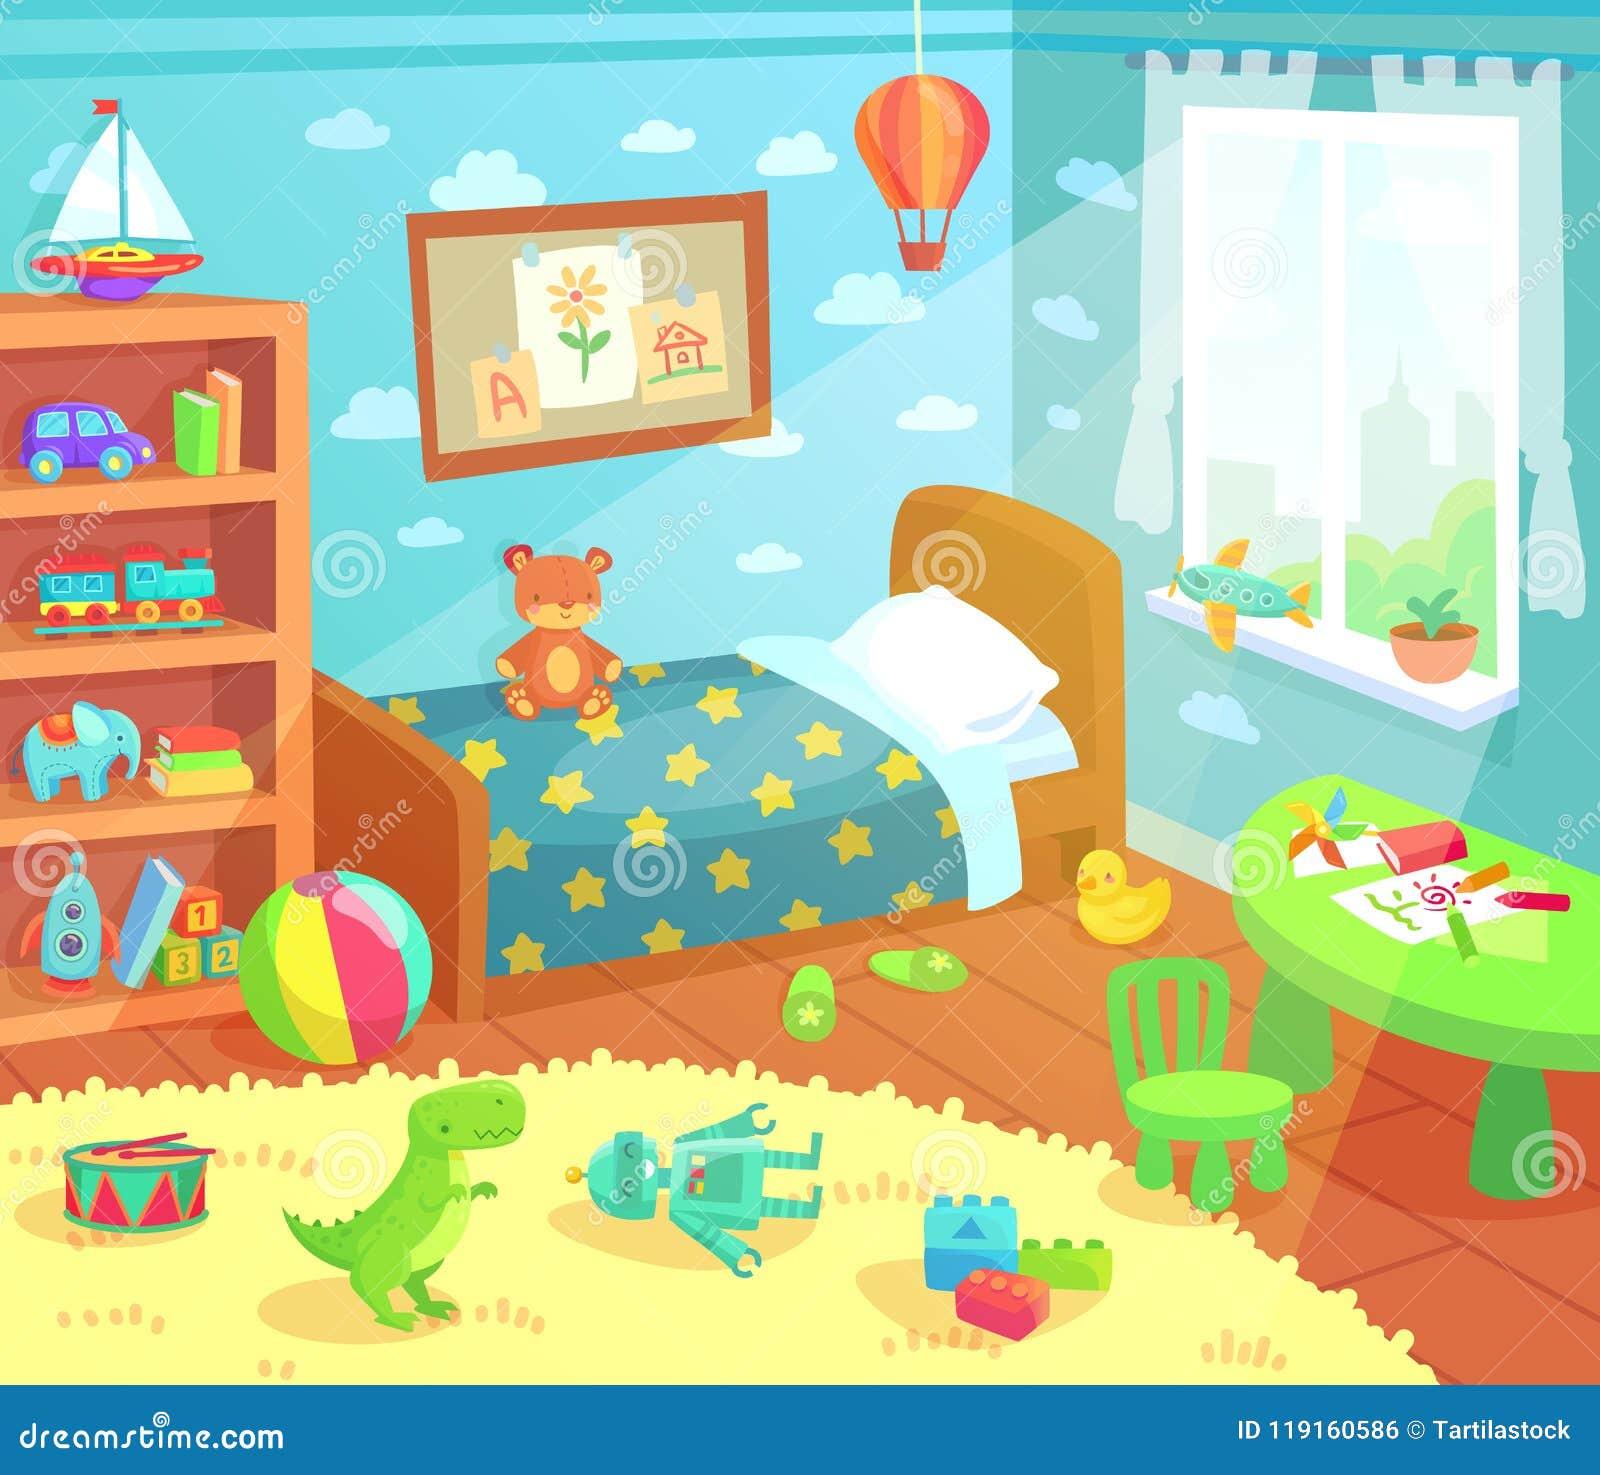 Kids Bedroom Stock Illustrations 4 164 Kids Bedroom Stock Illustrations Vectors Clipart Dreamstime